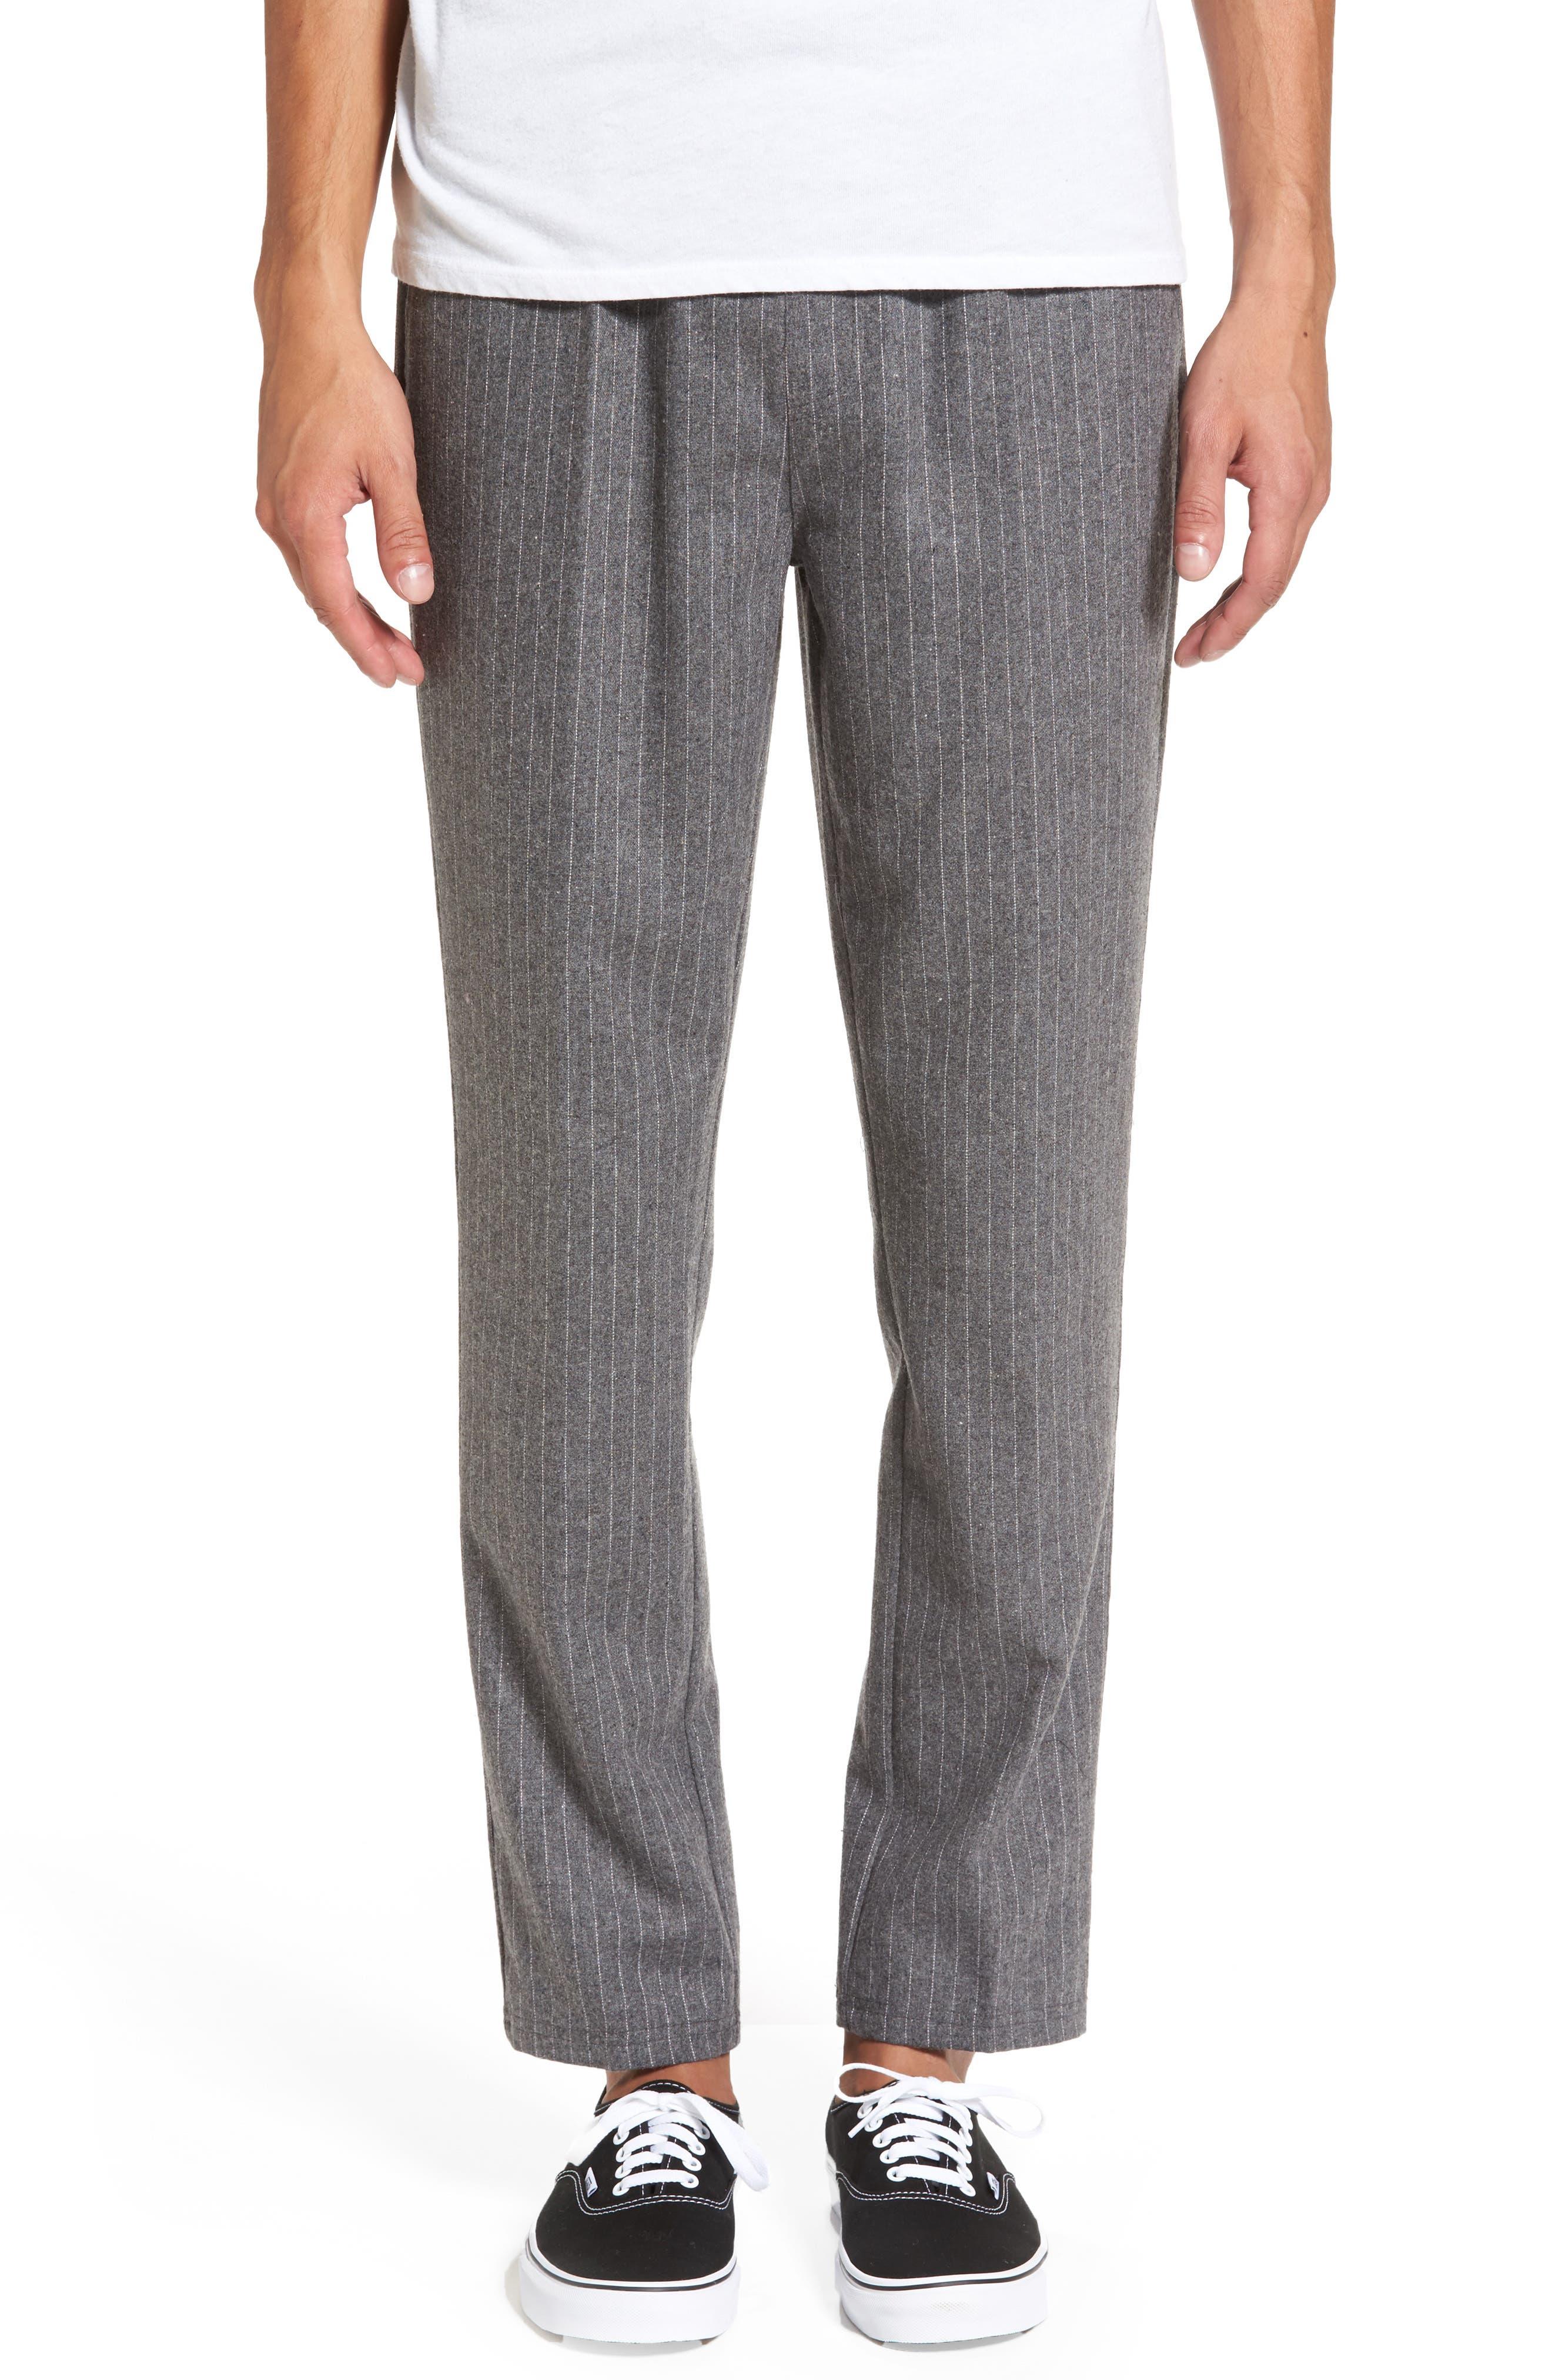 Pennyworth Pants,                         Main,                         color, 020